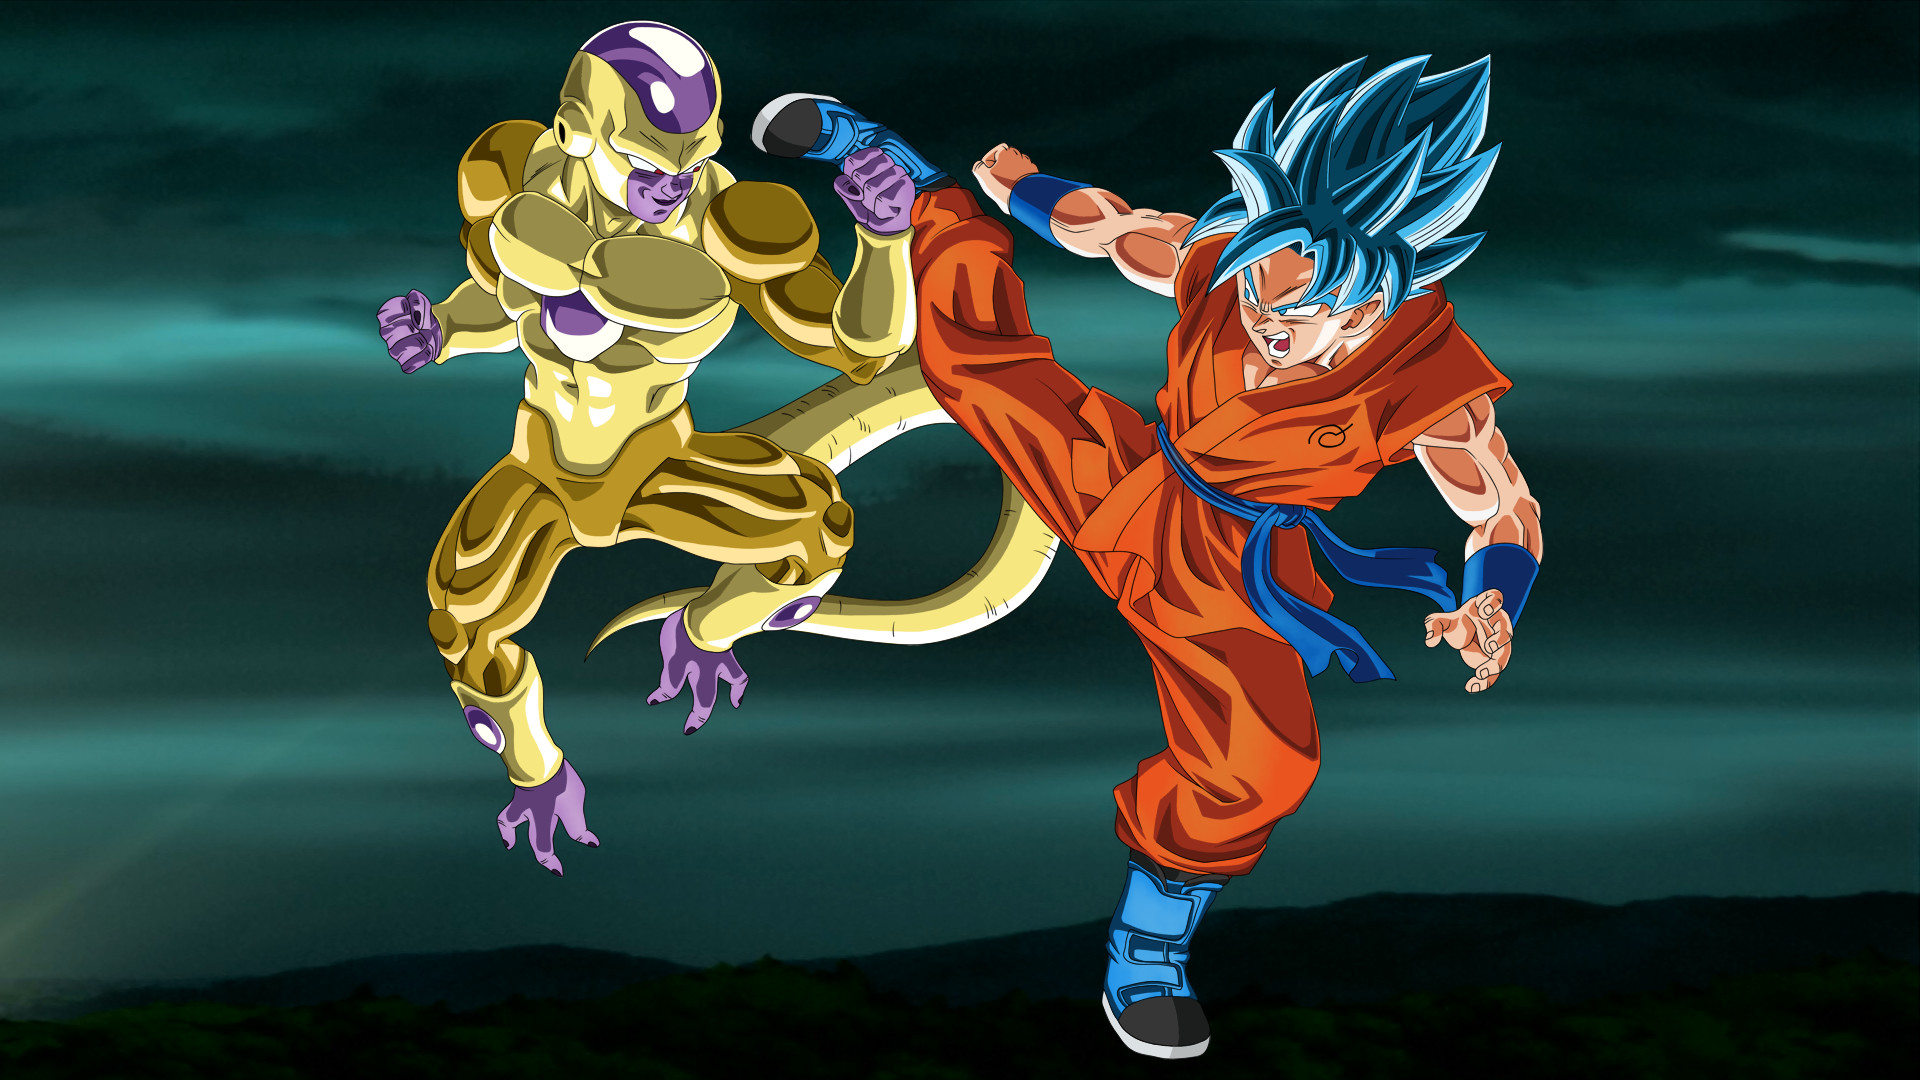 Res: 1920x1080, Gold Frieza vs SSGSS Goku no aura  by EymSmiley